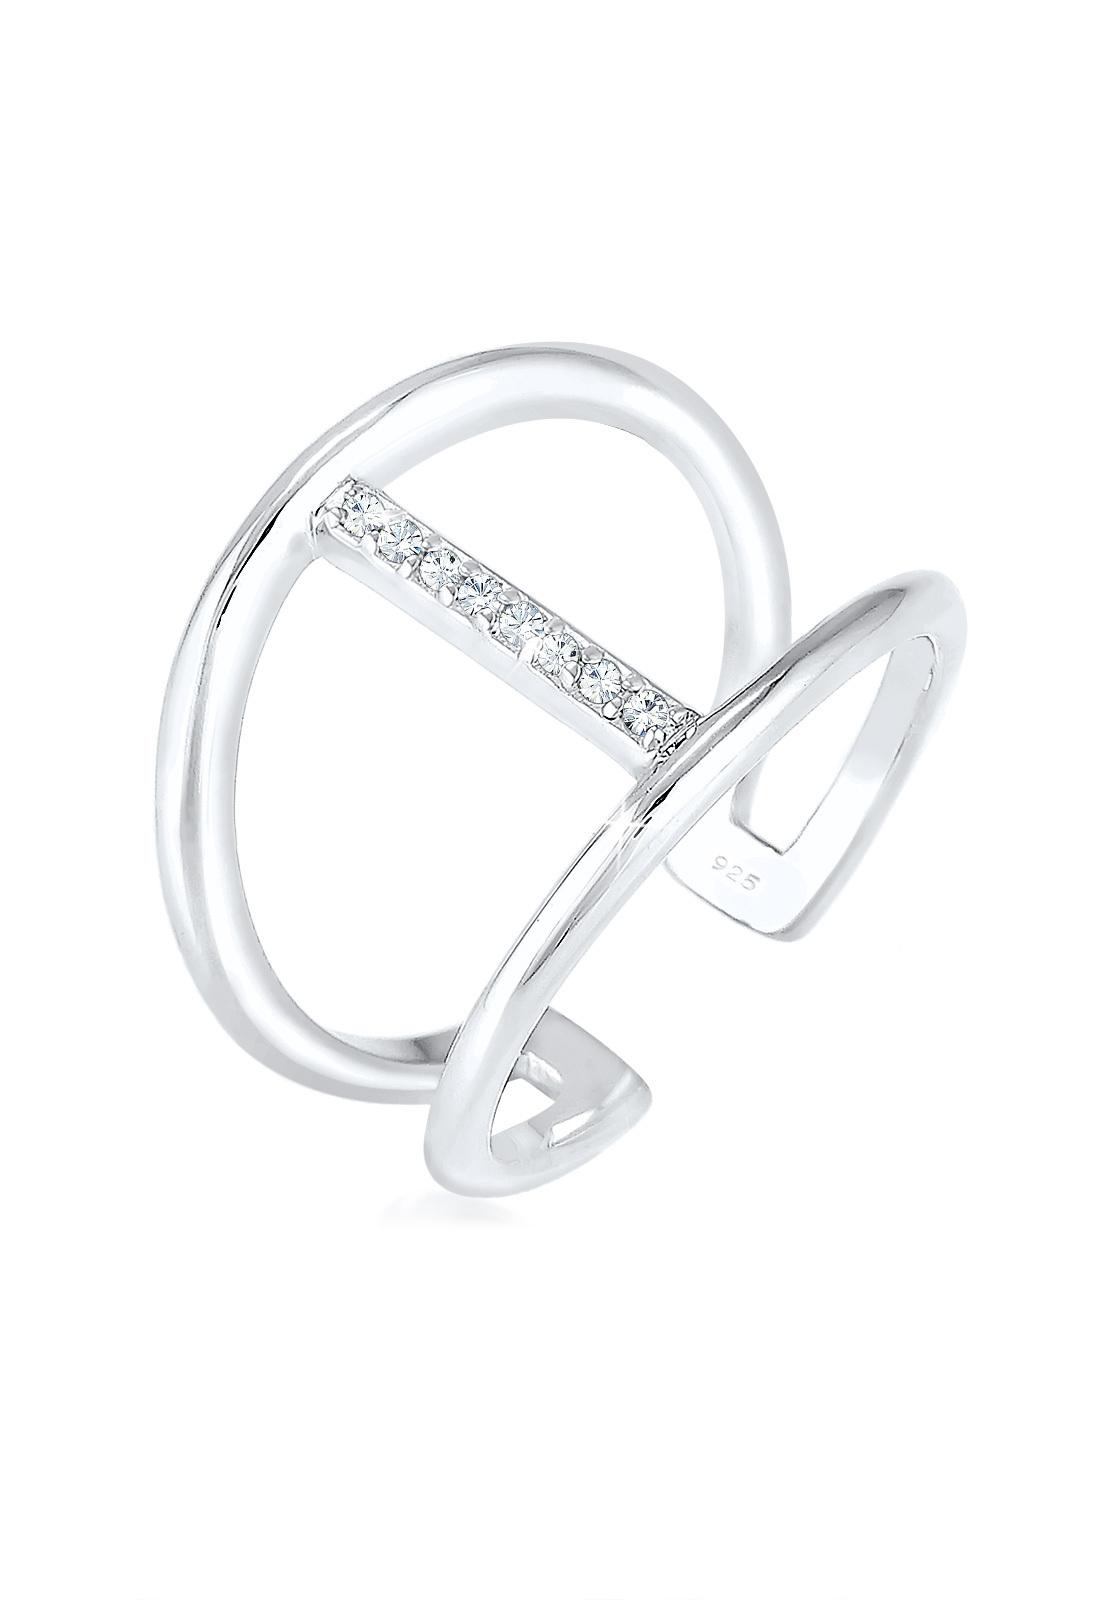 Ring Geo   Kristall ( Weiß )   925er Sterling Silber